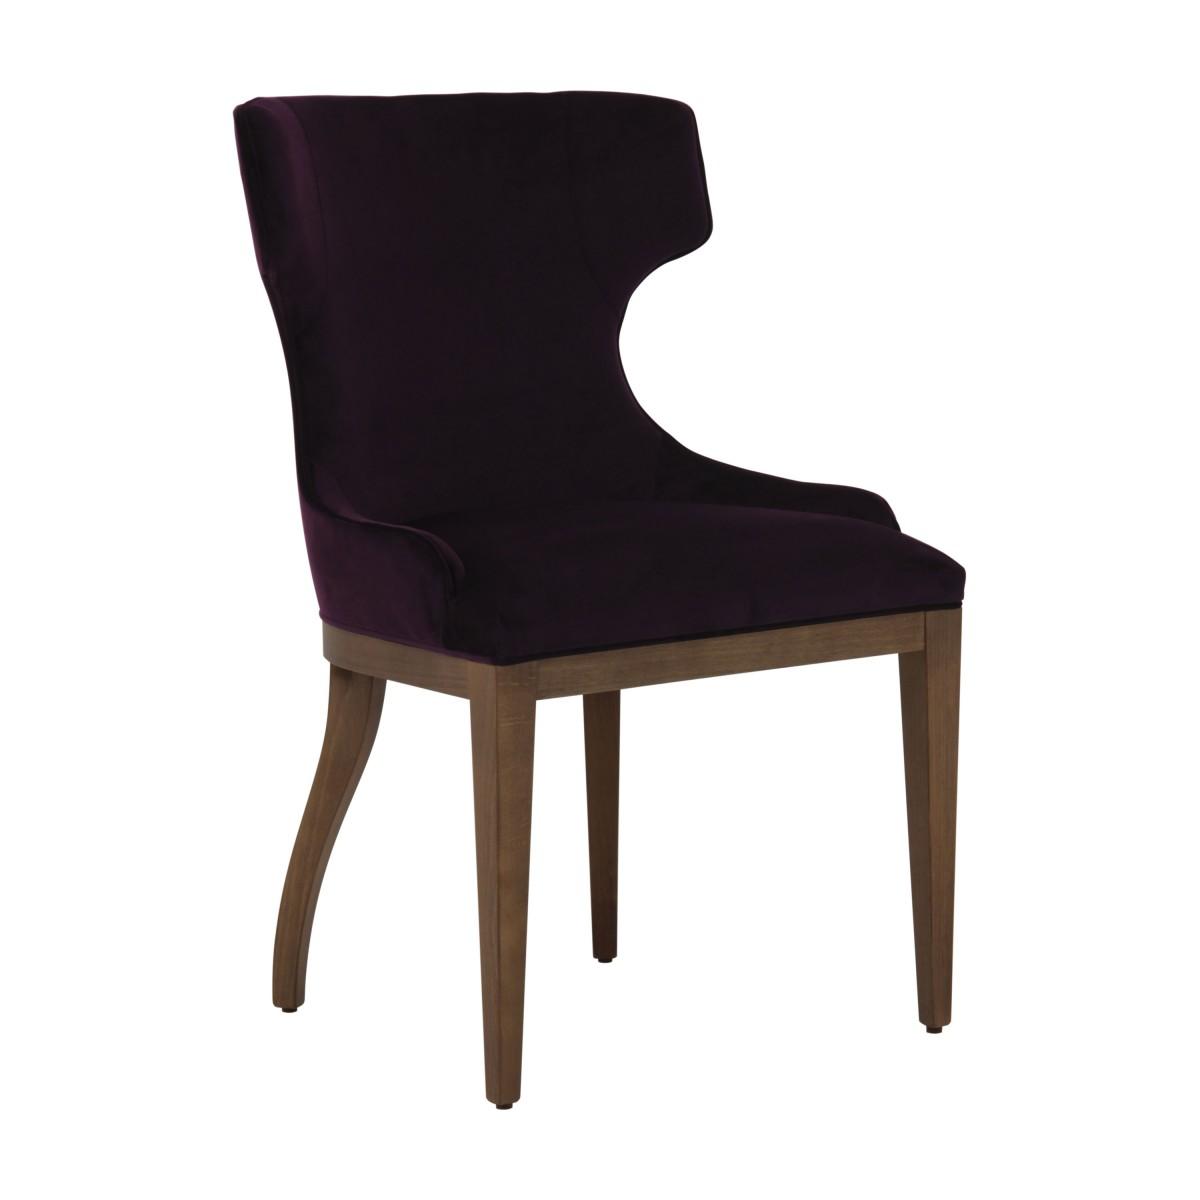 contemporary chair rachele 1 829